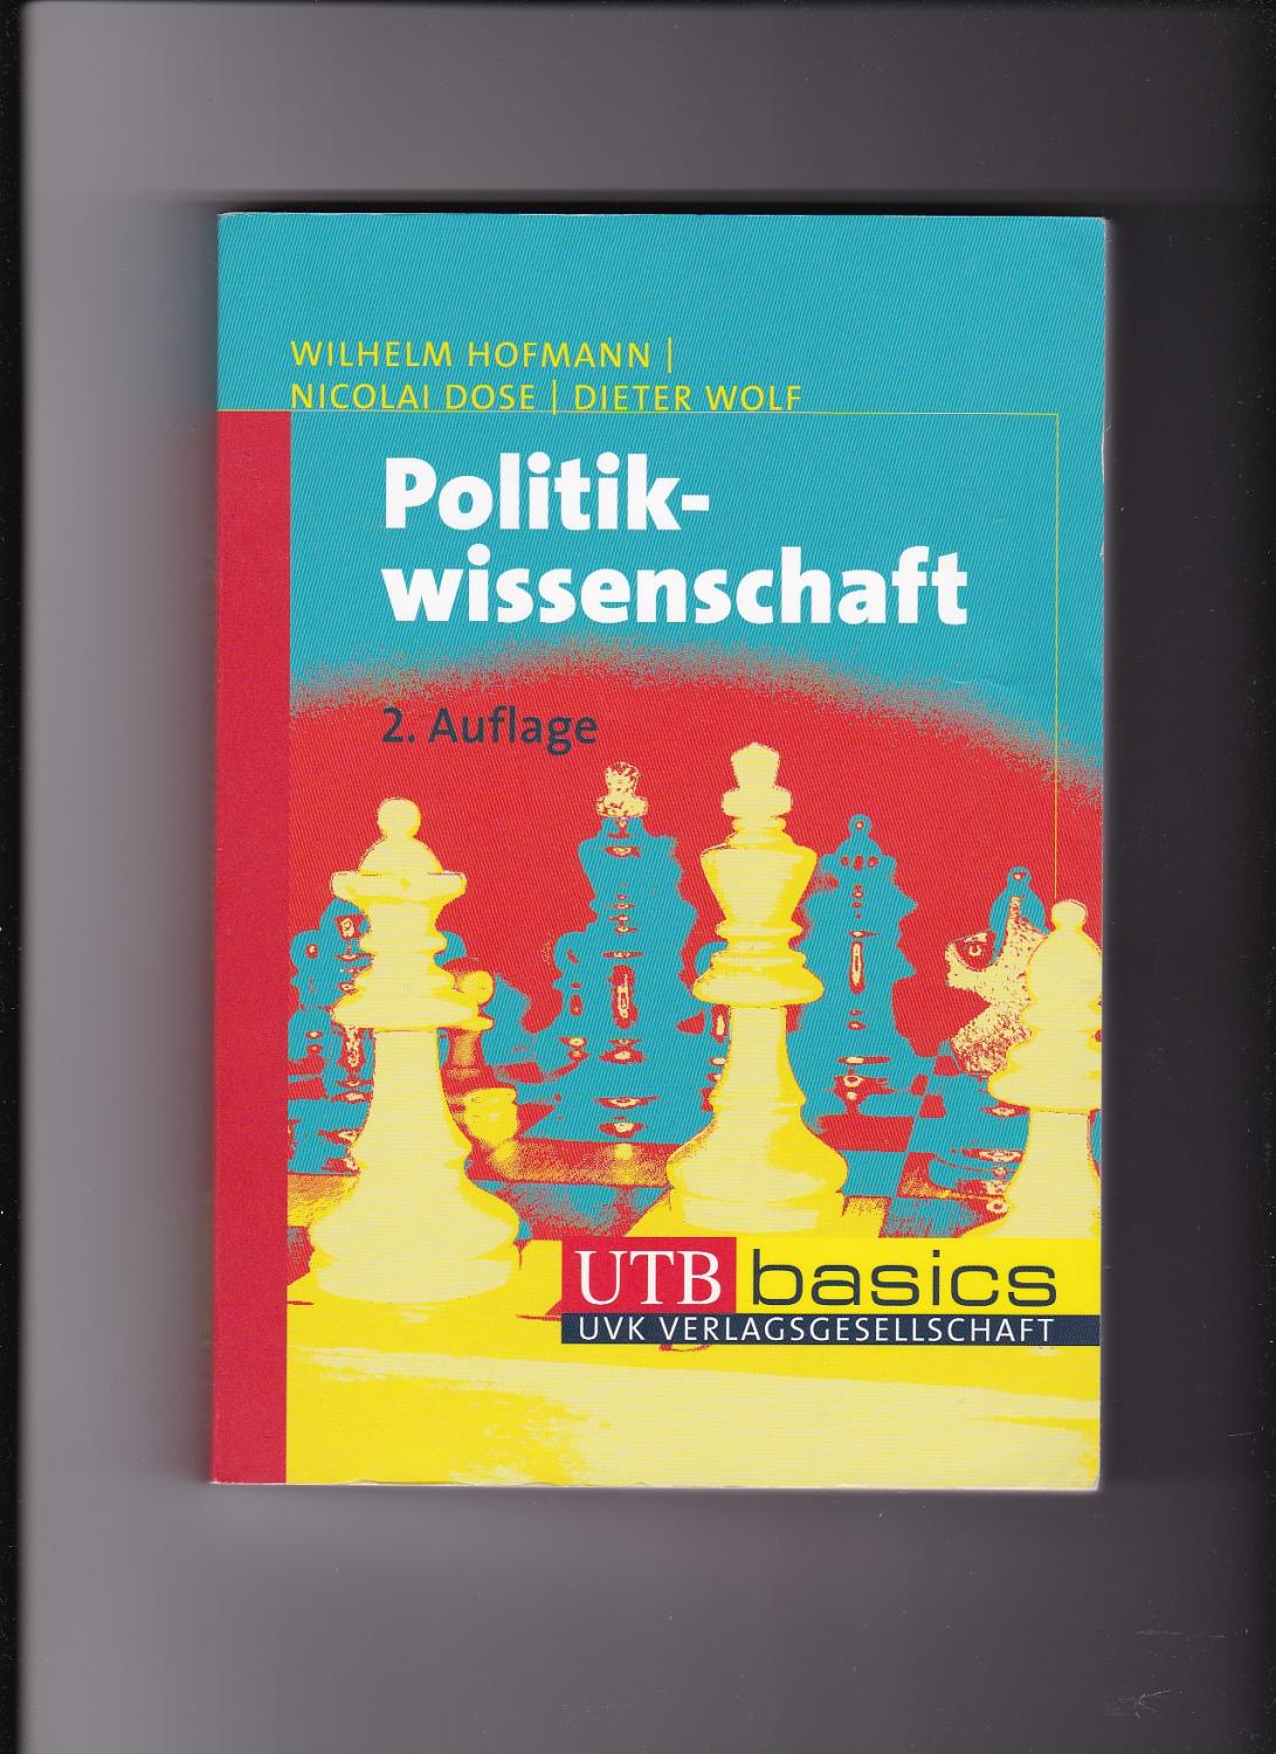 Wilhelm Hofmann, Nicolai Dose, Politikwissenschaft - UTB Basics - Hofmann, Wilhelm (Verfasser), Nicolai (Verfasser) Dose und Dieter (Verfasser) Wolf